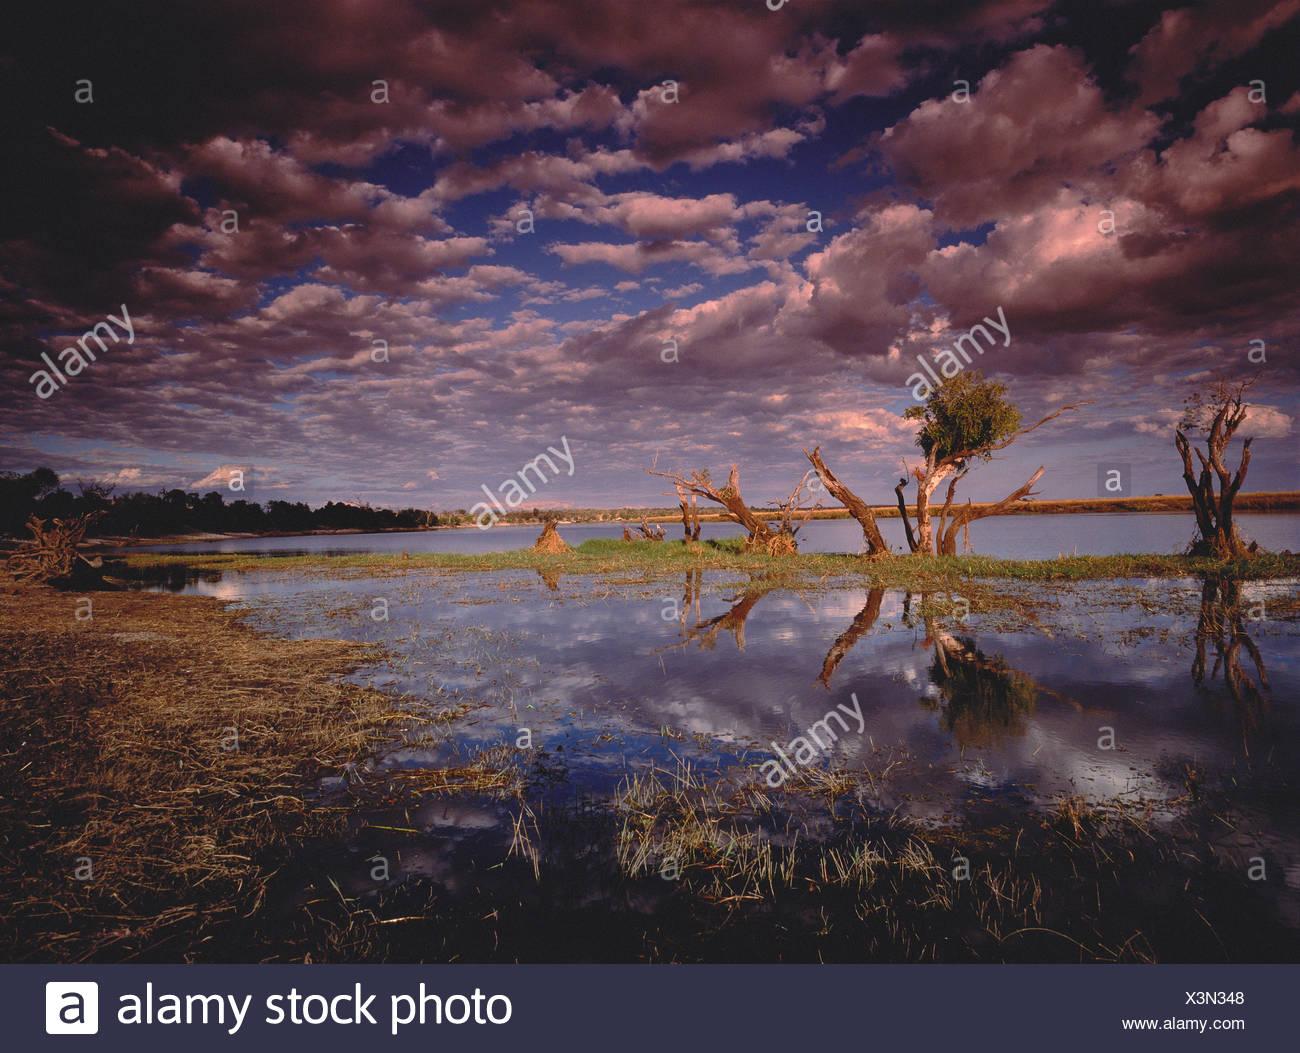 Chobe River and Cloudy Sky Botswana, Africa - Stock Image